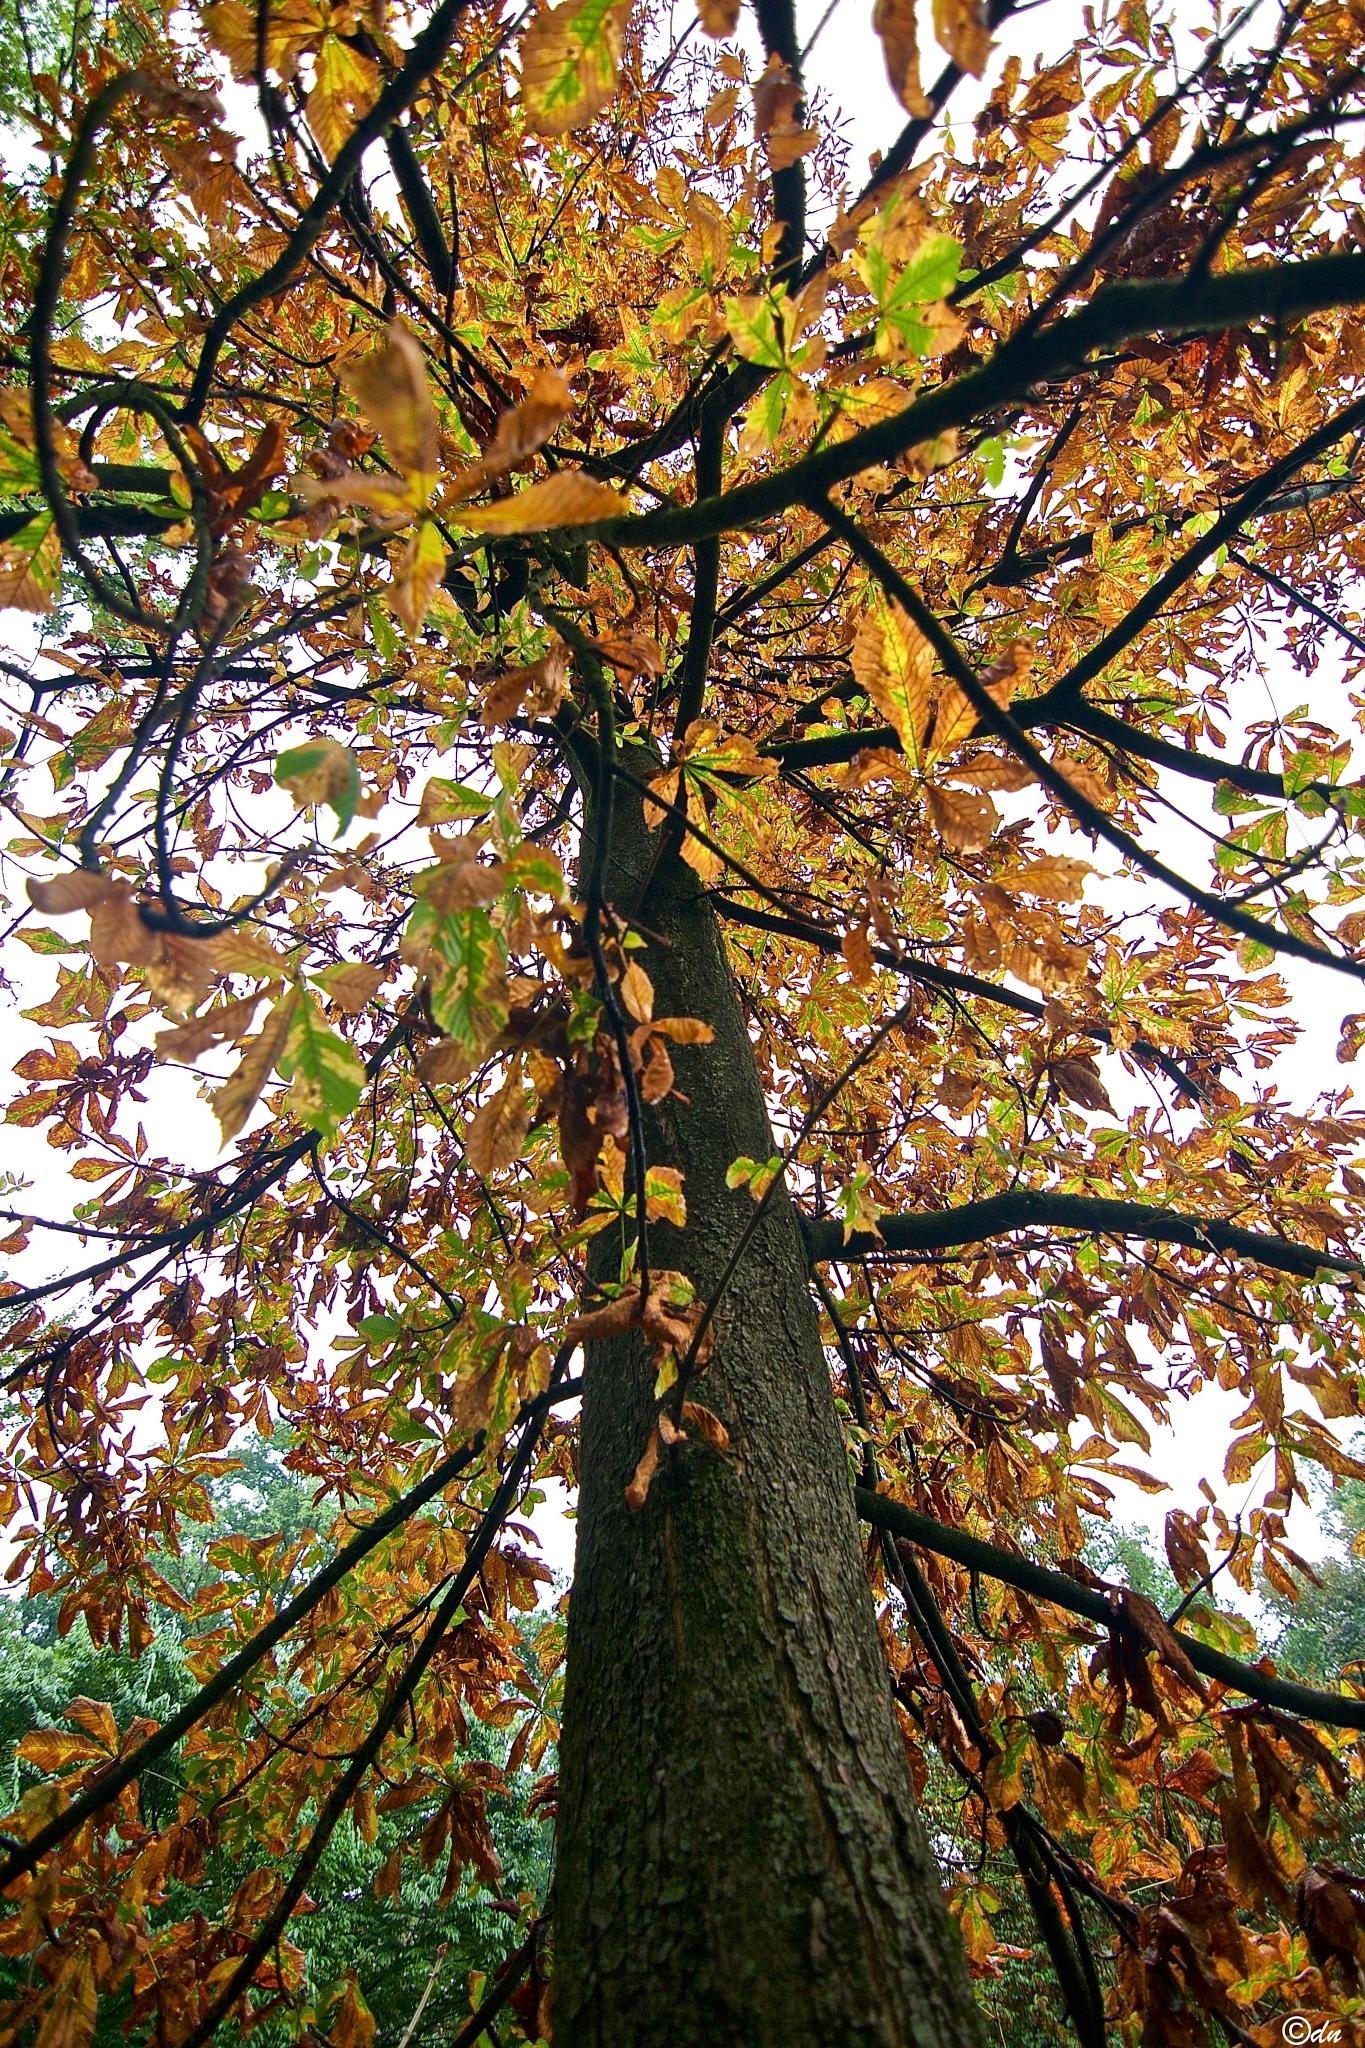 albero by DavideNegro